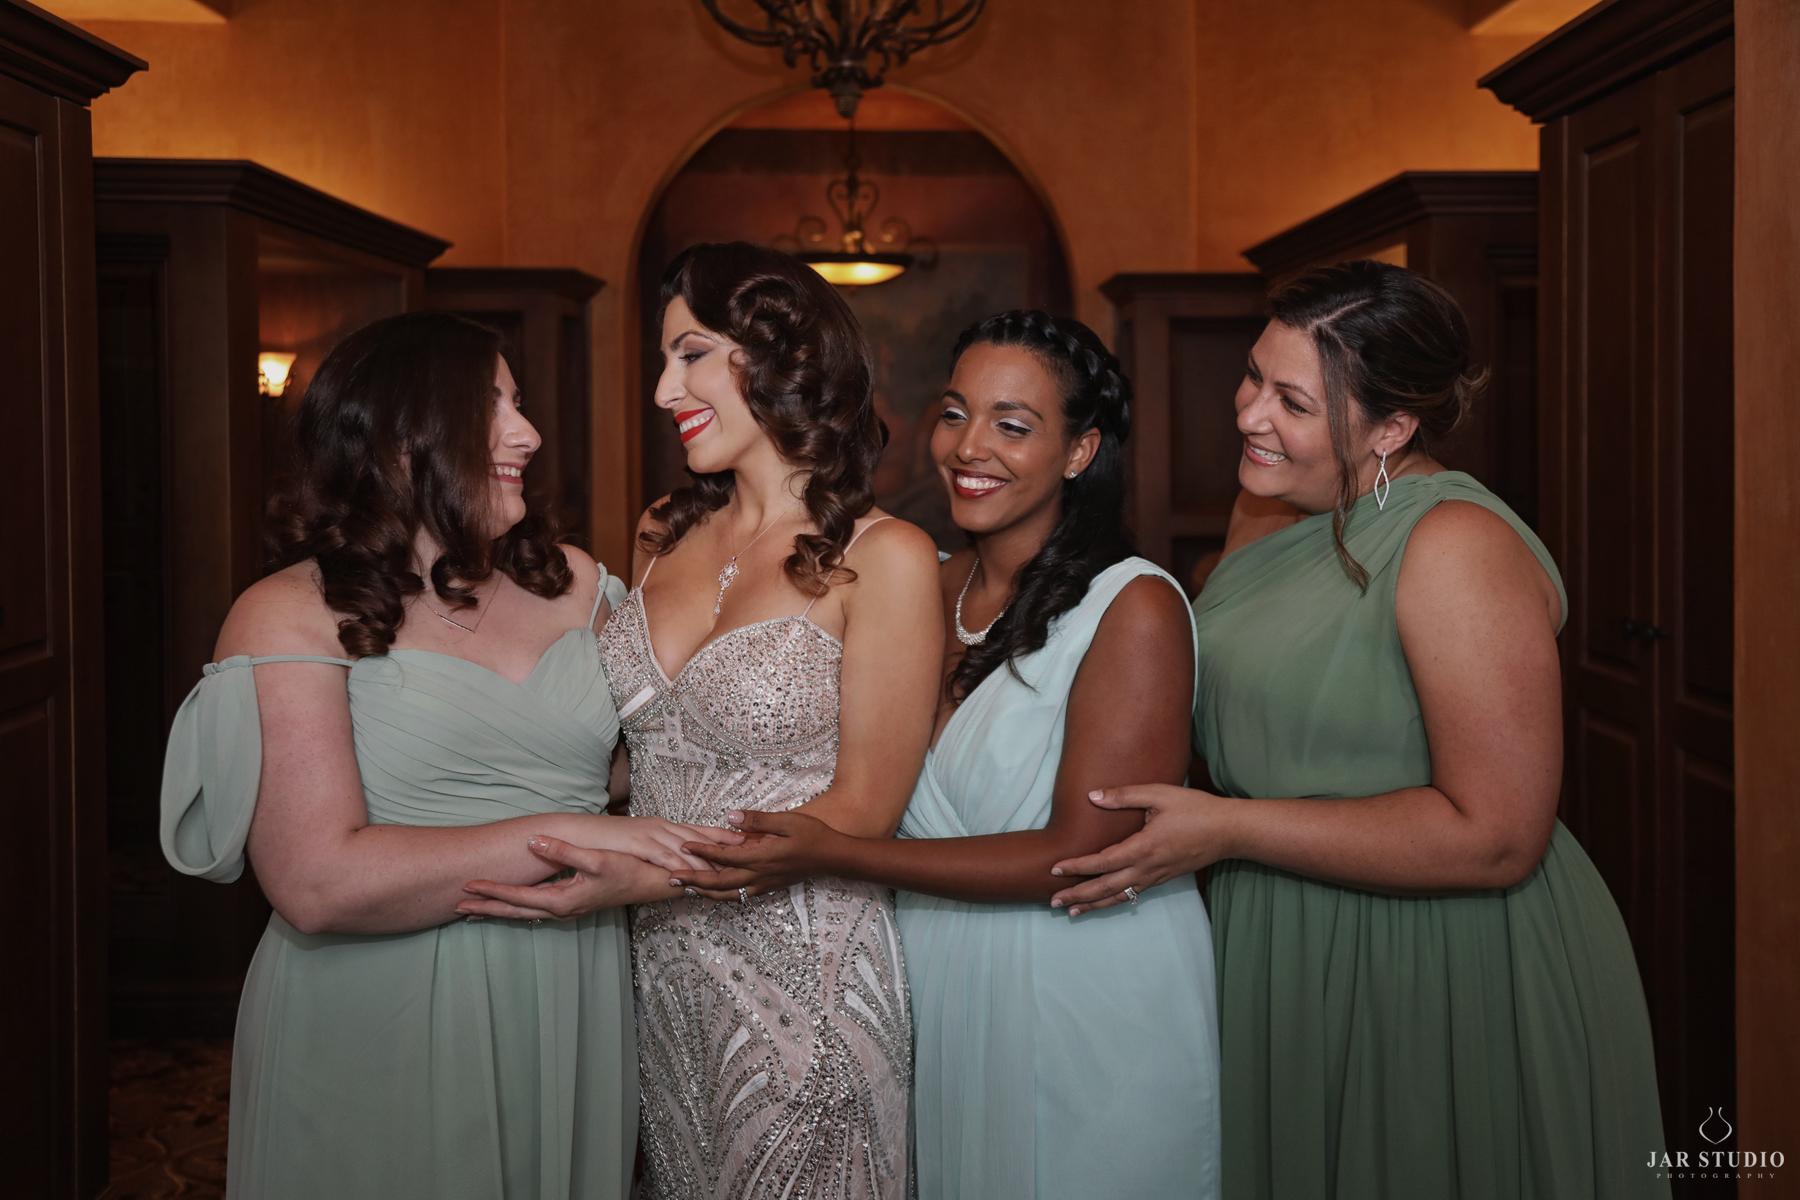 07-beautifull-italian-bride-bridemaids-sage-jarstudio.jpg